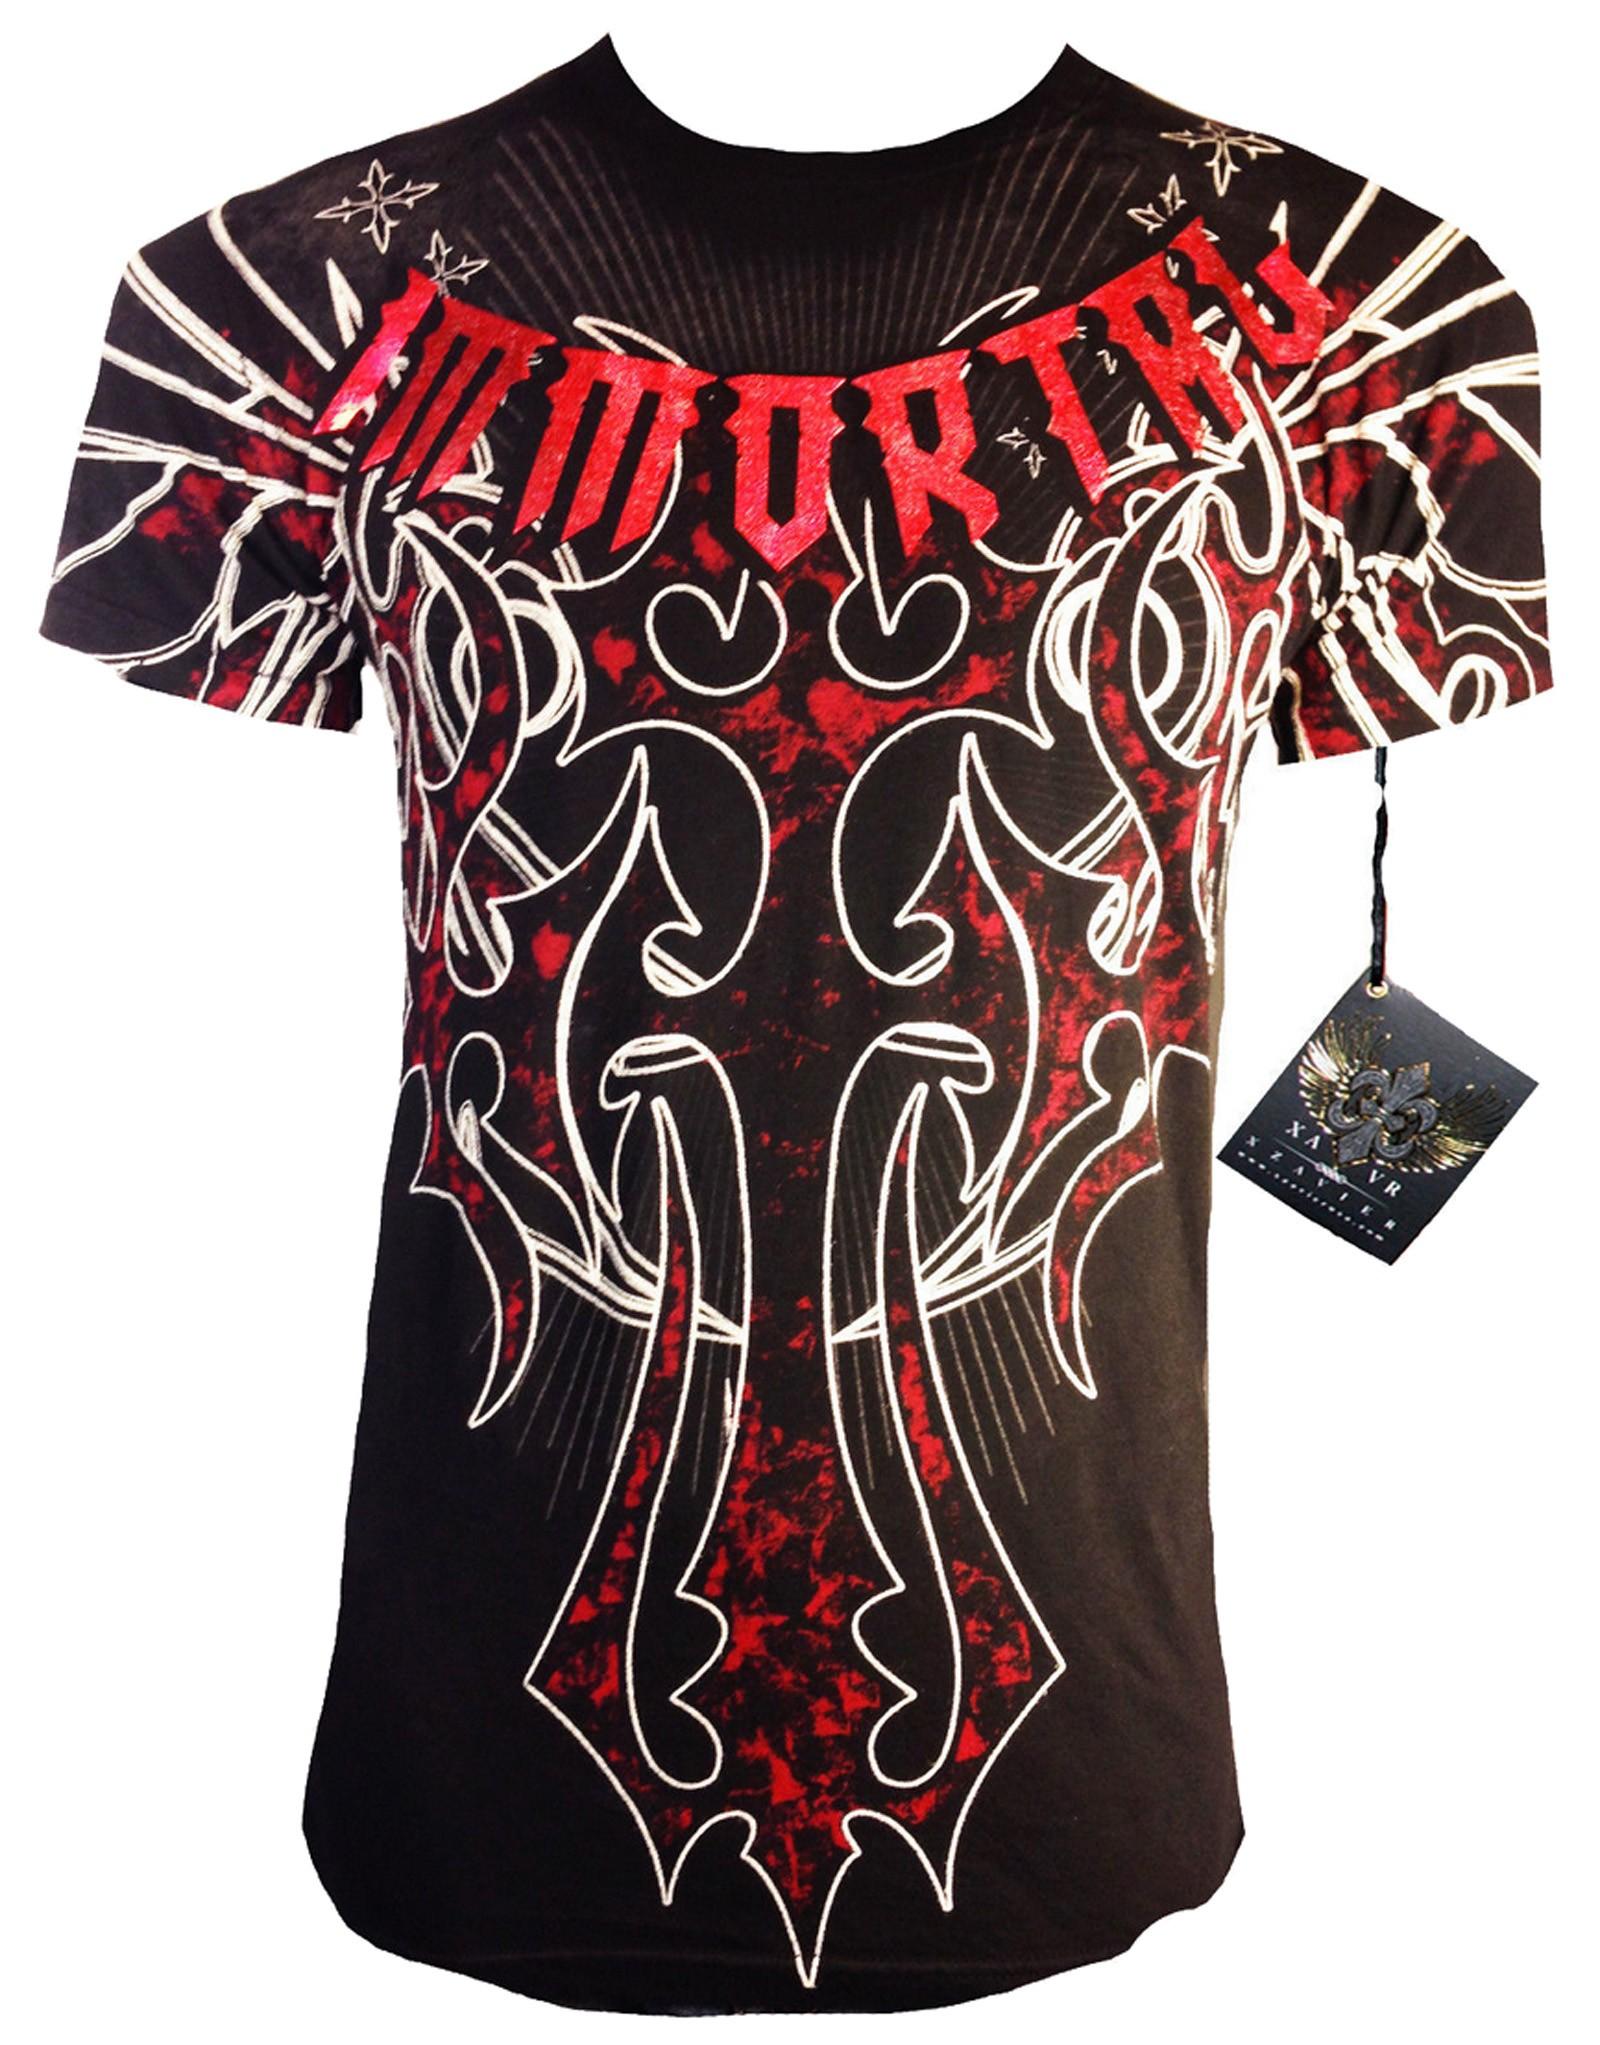 Xzavier - Razor Wings T-Shirt Front